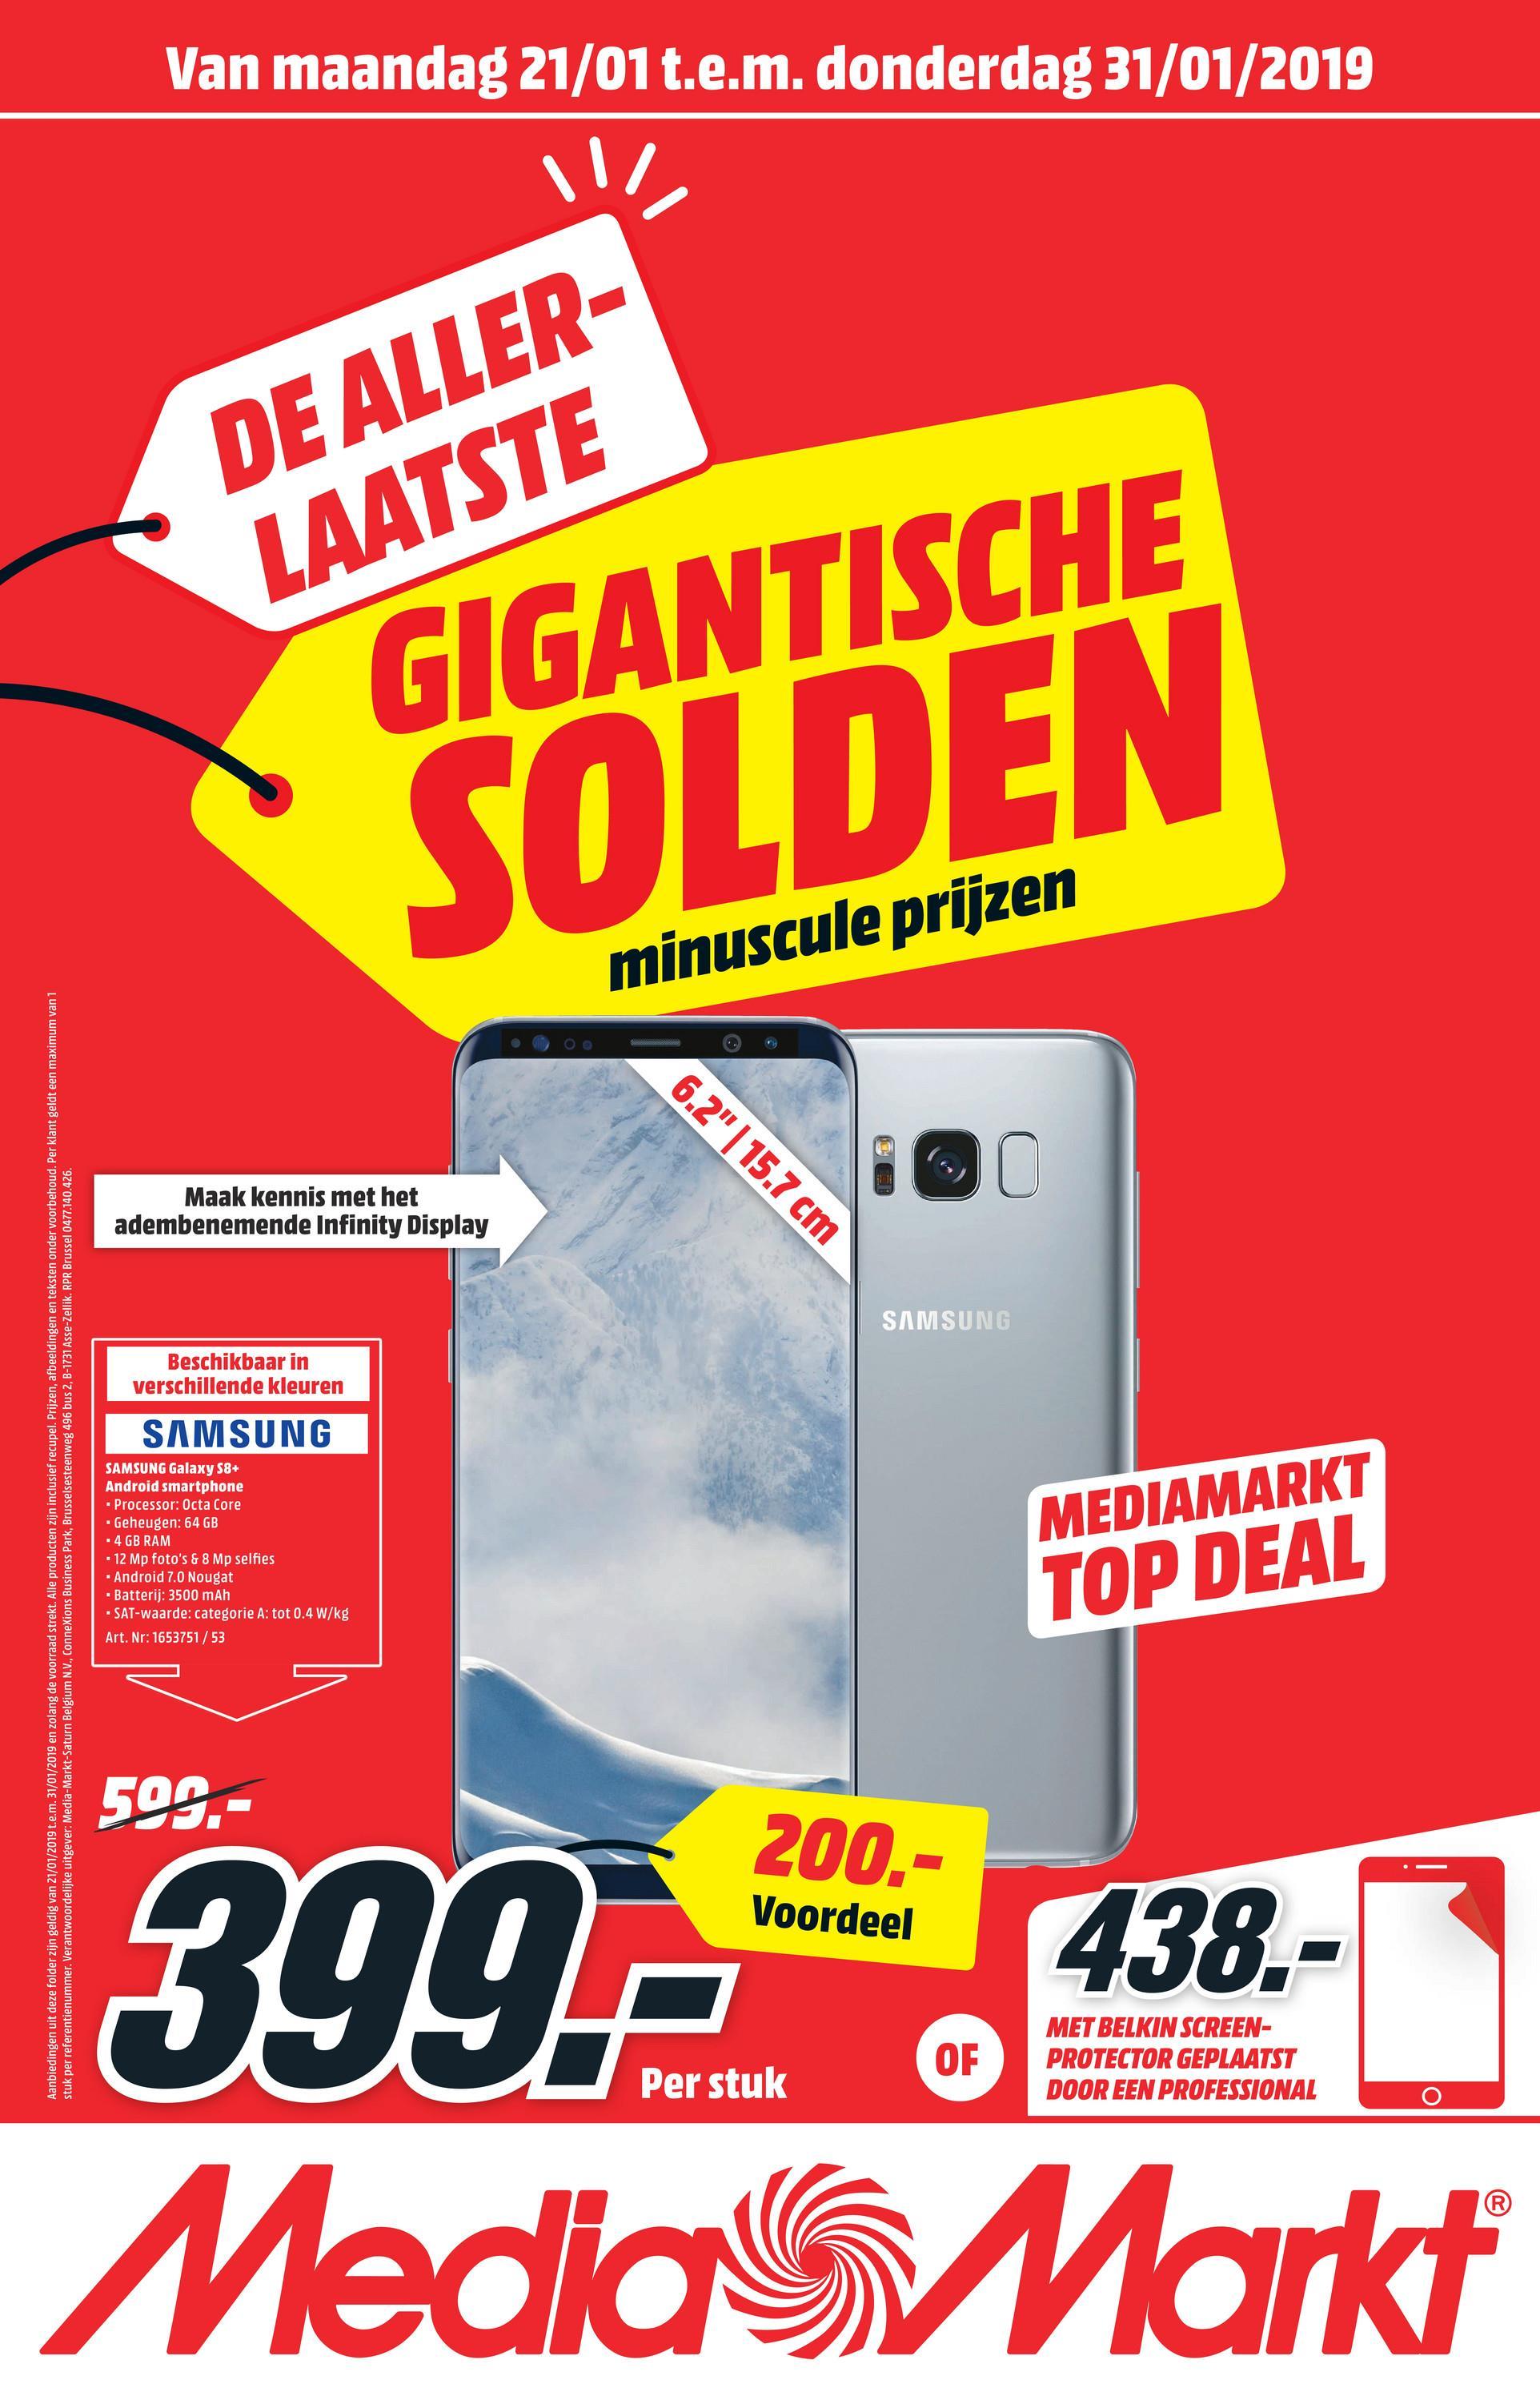 SAMSUNG Smartphone Galaxy S8+ 64 GB Arctic Silver (SM-G955FZSALUX) SAMSUNG Smartphone Galaxy S8+ 64 GB Arctic Silver (SM-G955FZSALUX)